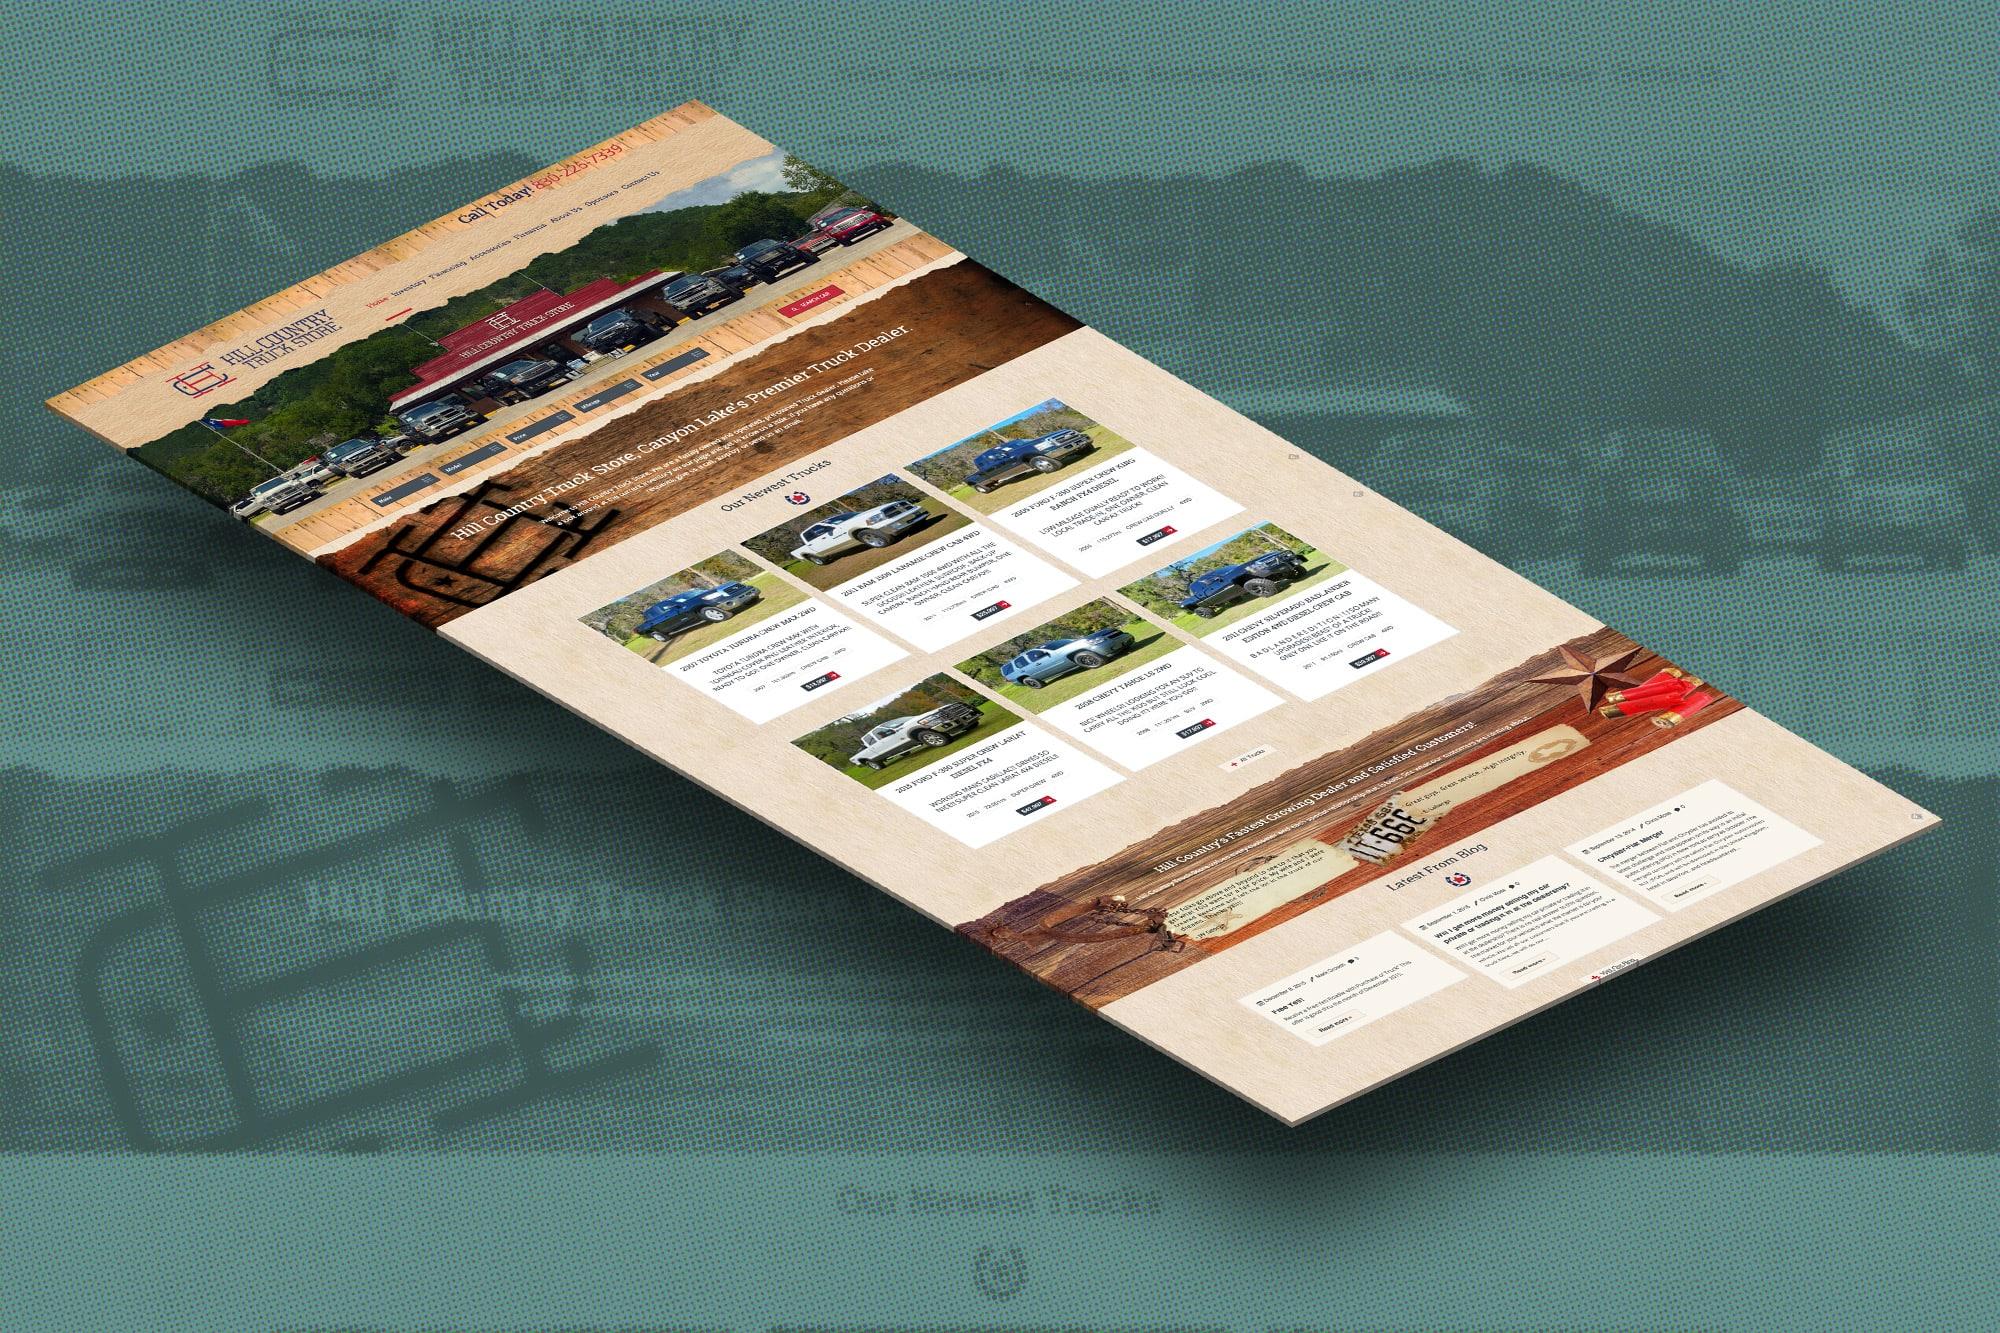 San Antonio Web Design Hill Country Truck Store Website 3D